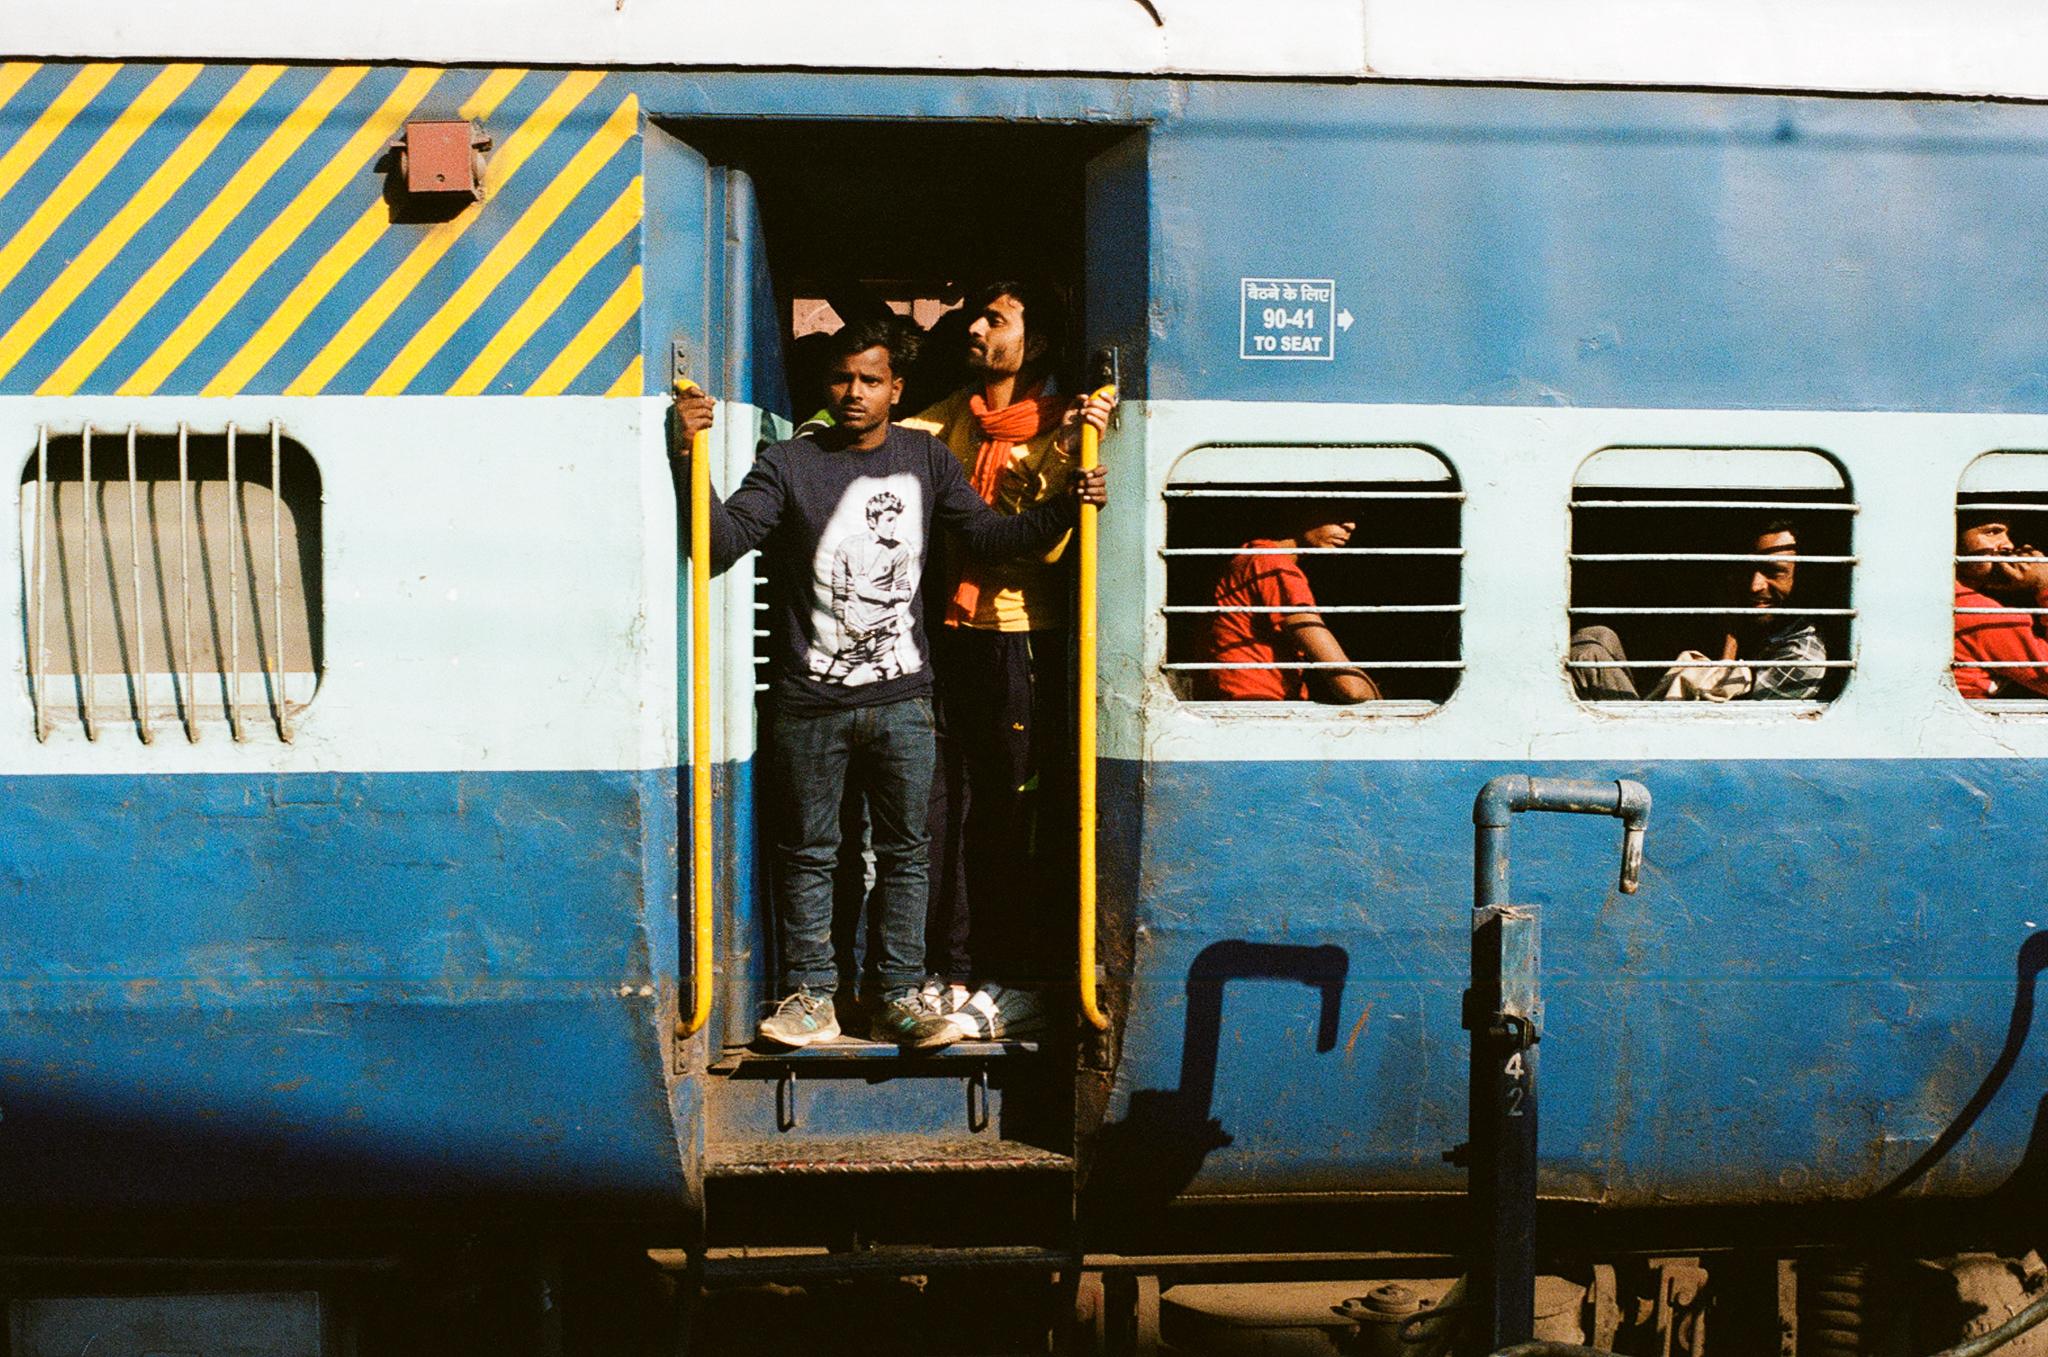 Agra India Travel Street Photography (38 of 39).jpg